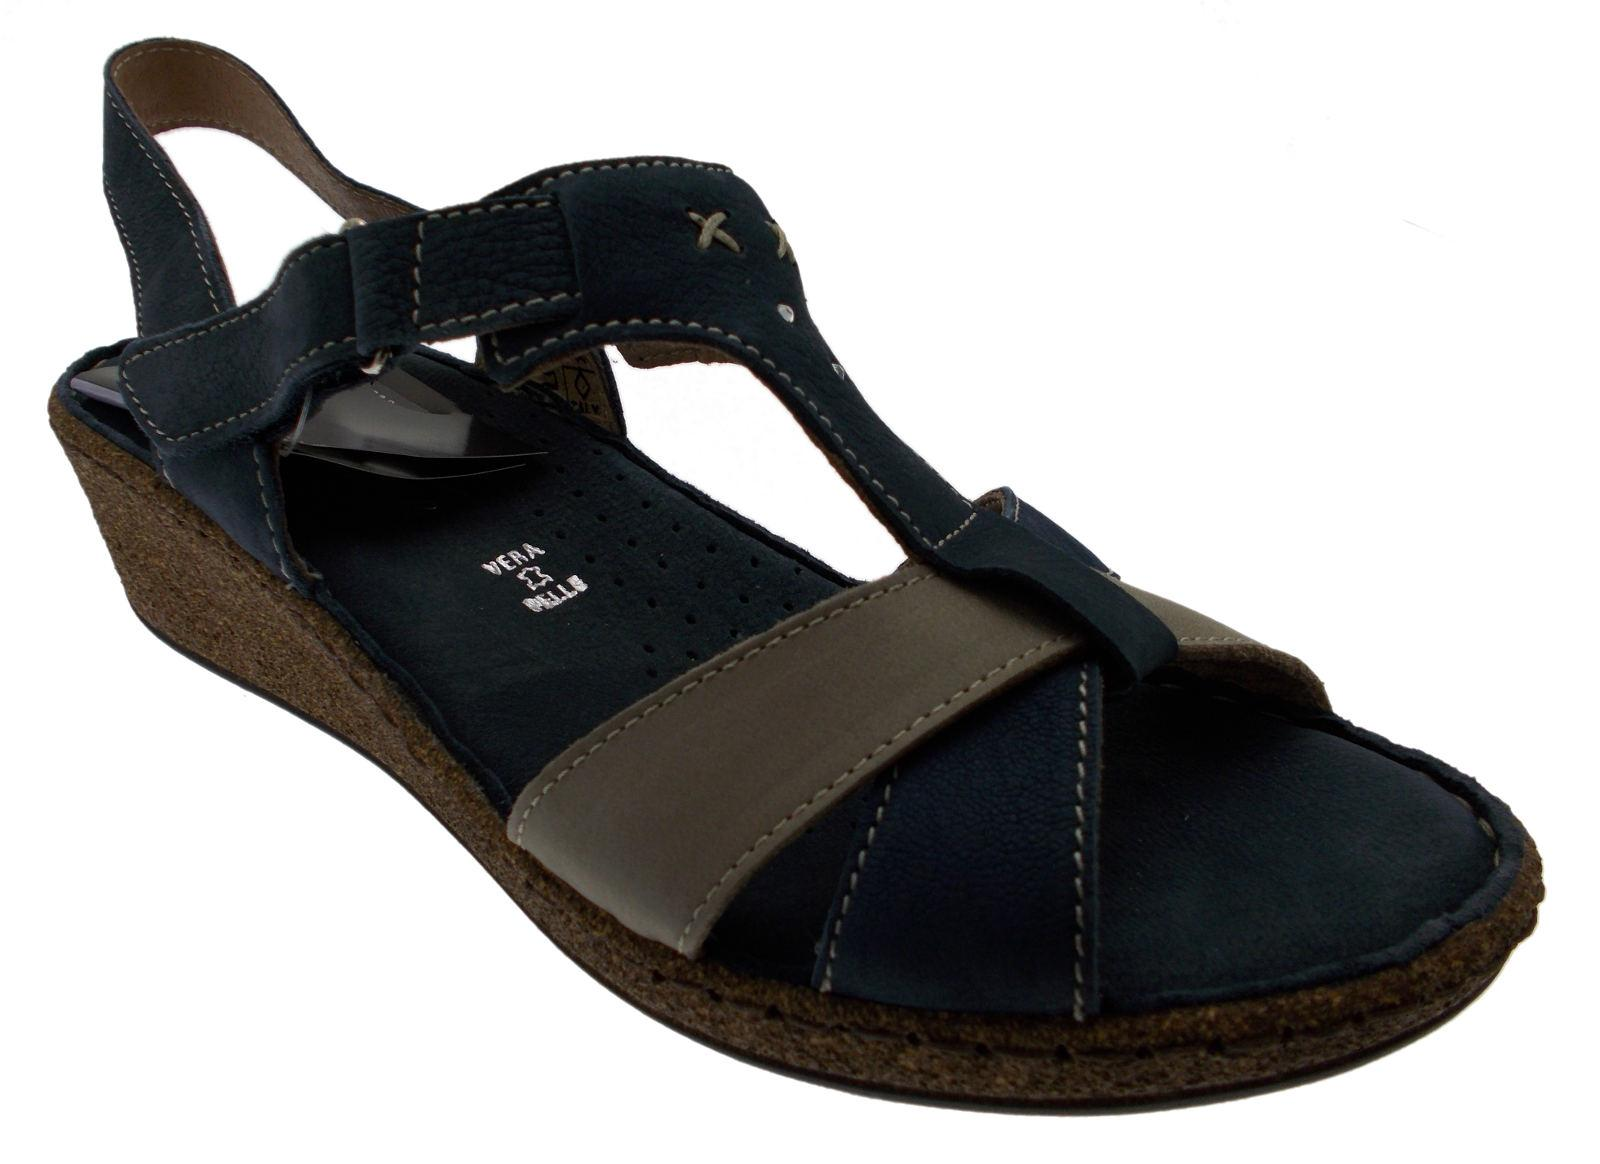 Sandalo nabuk multicolor blue  art 22820-2 Florance